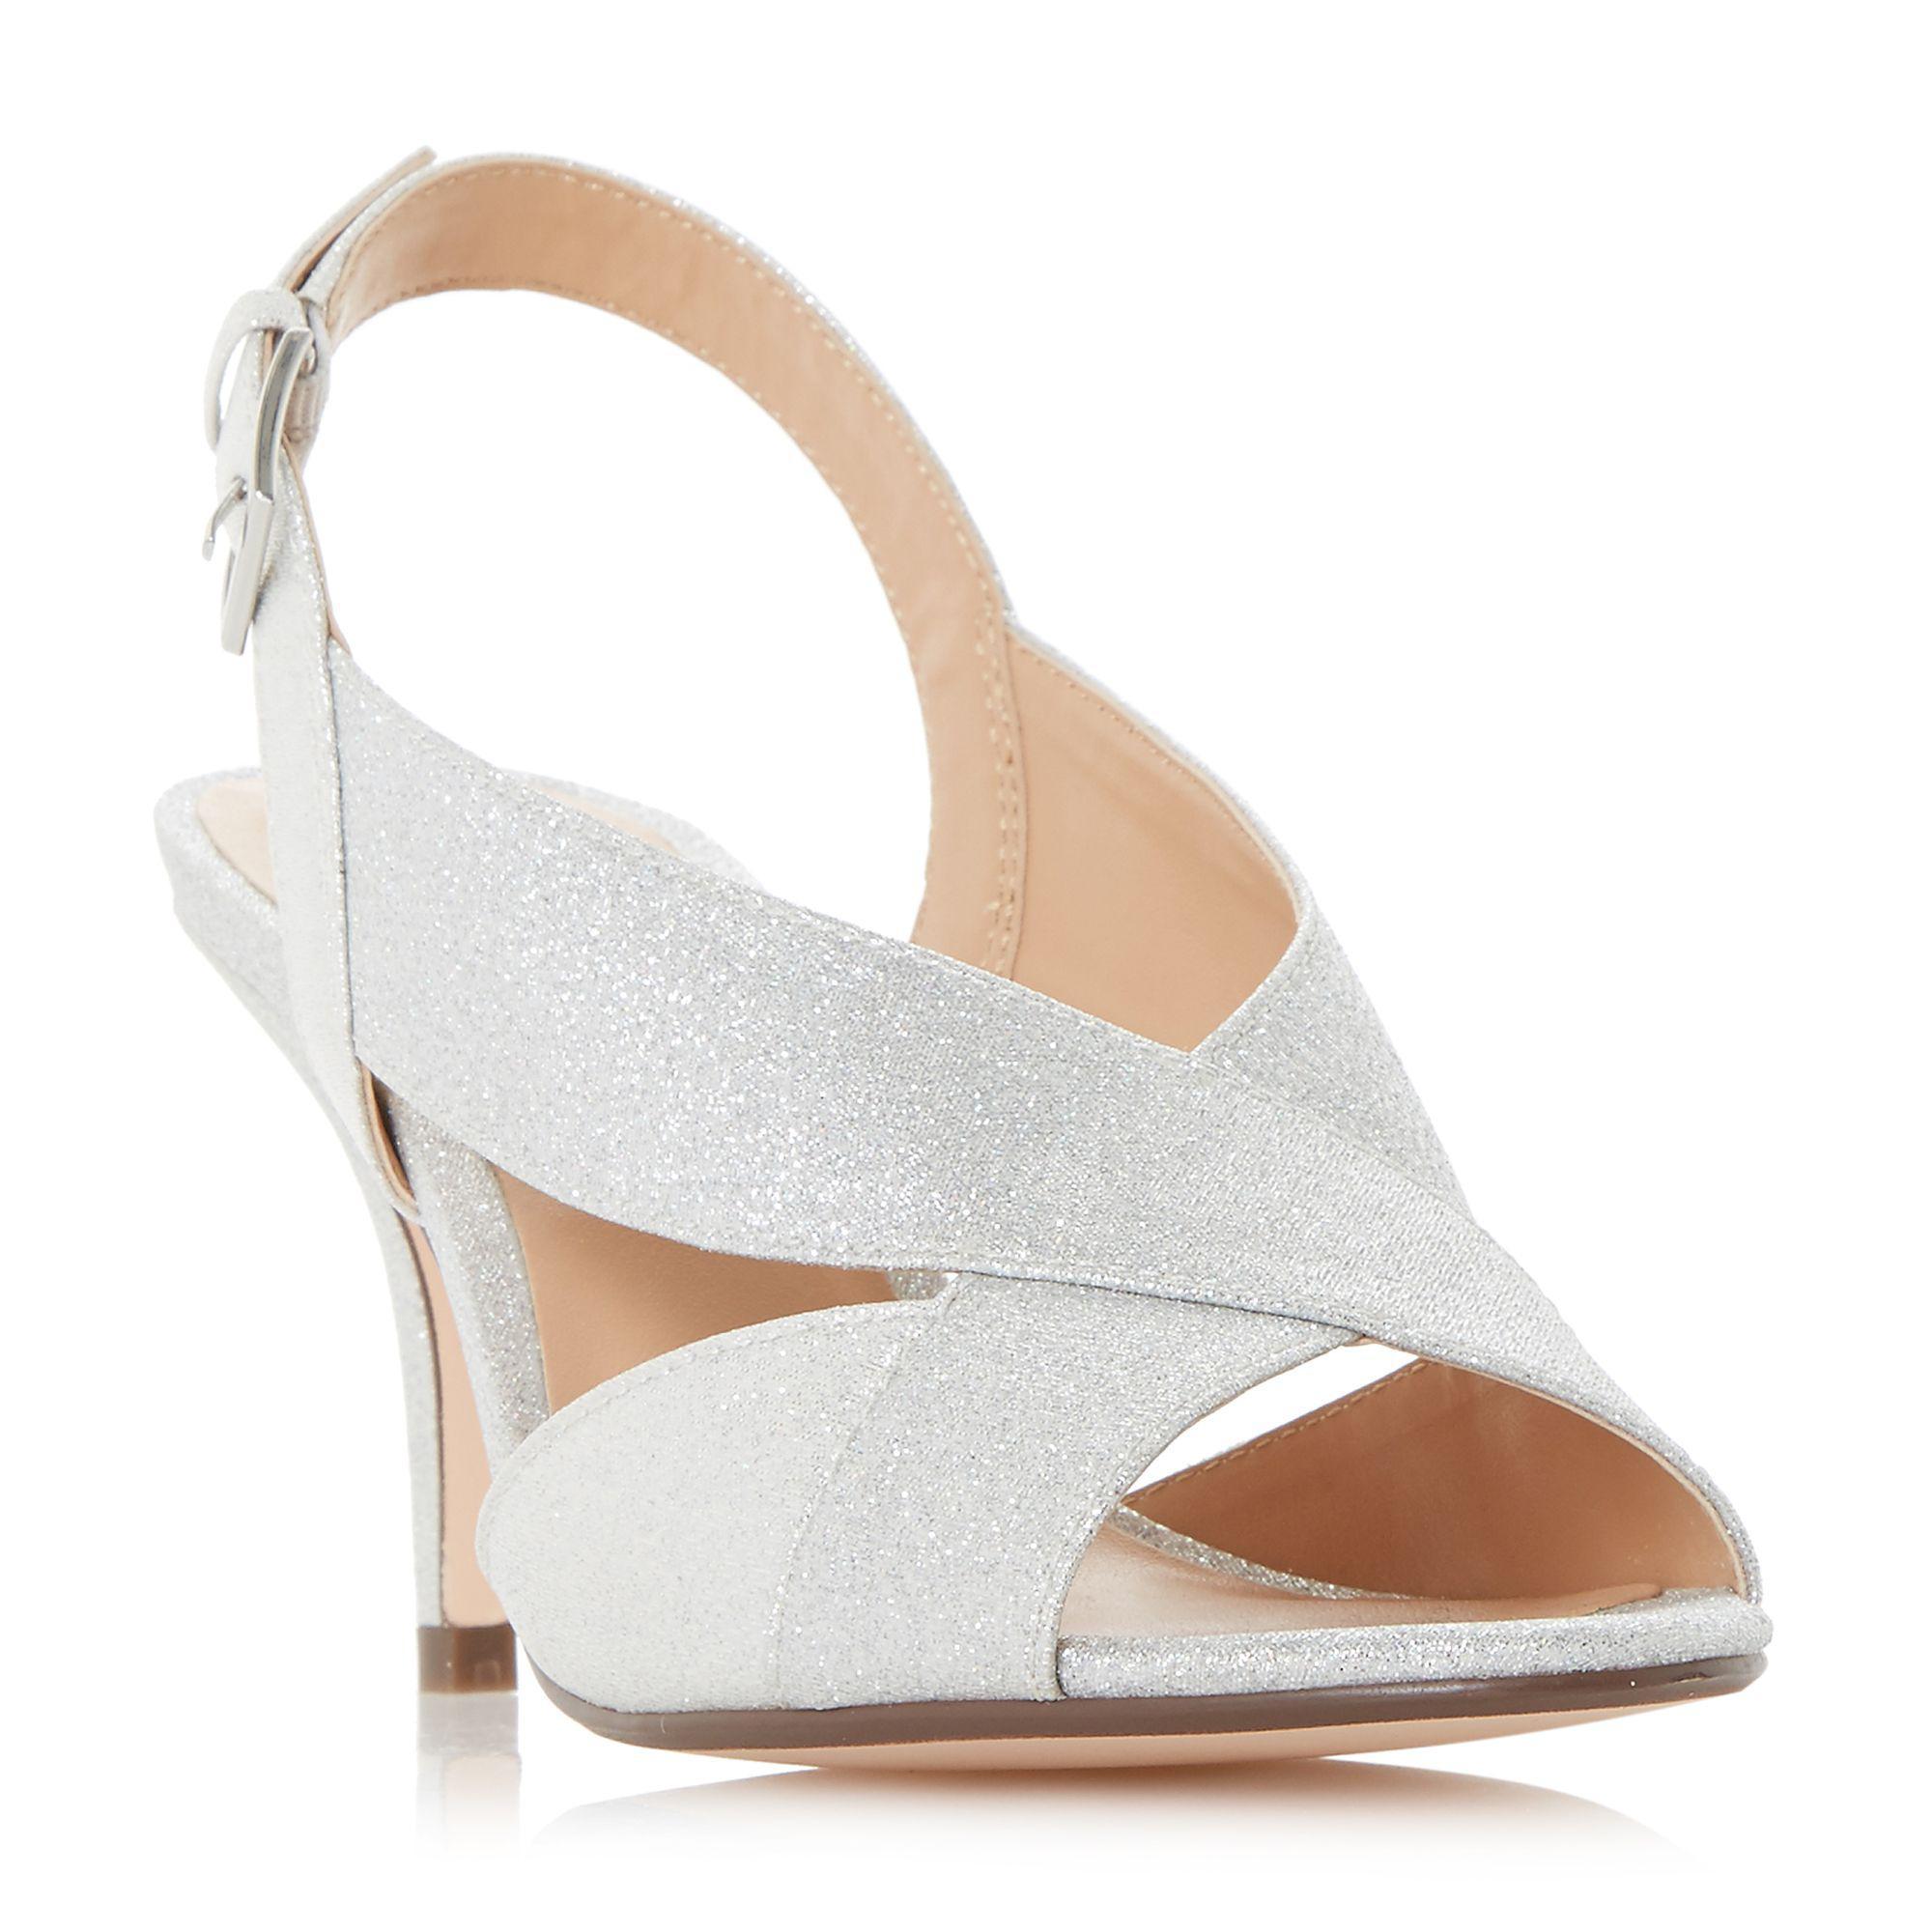 46622ee2e54 Roland Cartier Silver  matilda  Mid Kitten Heel Court Shoes in ...